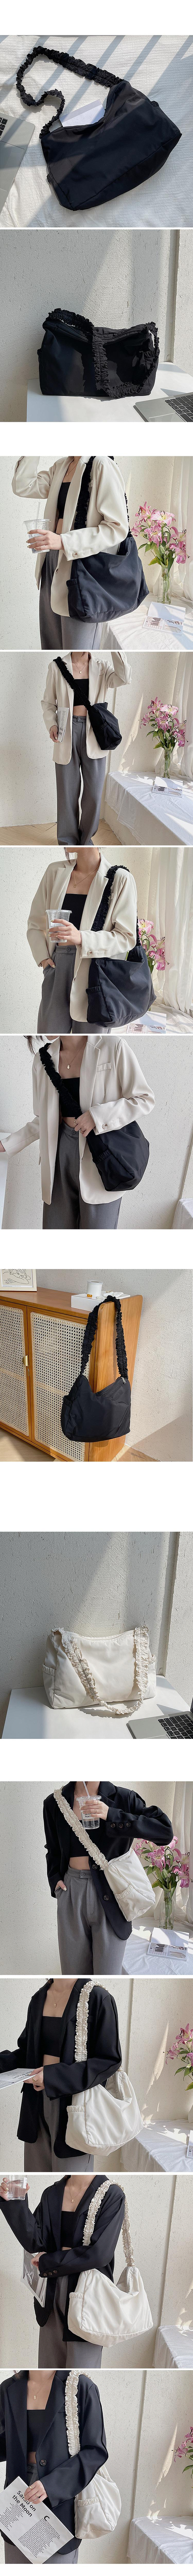 Soft Ruffle Shirring Shoulder Bag Gopchang Cross Bag B#YW110